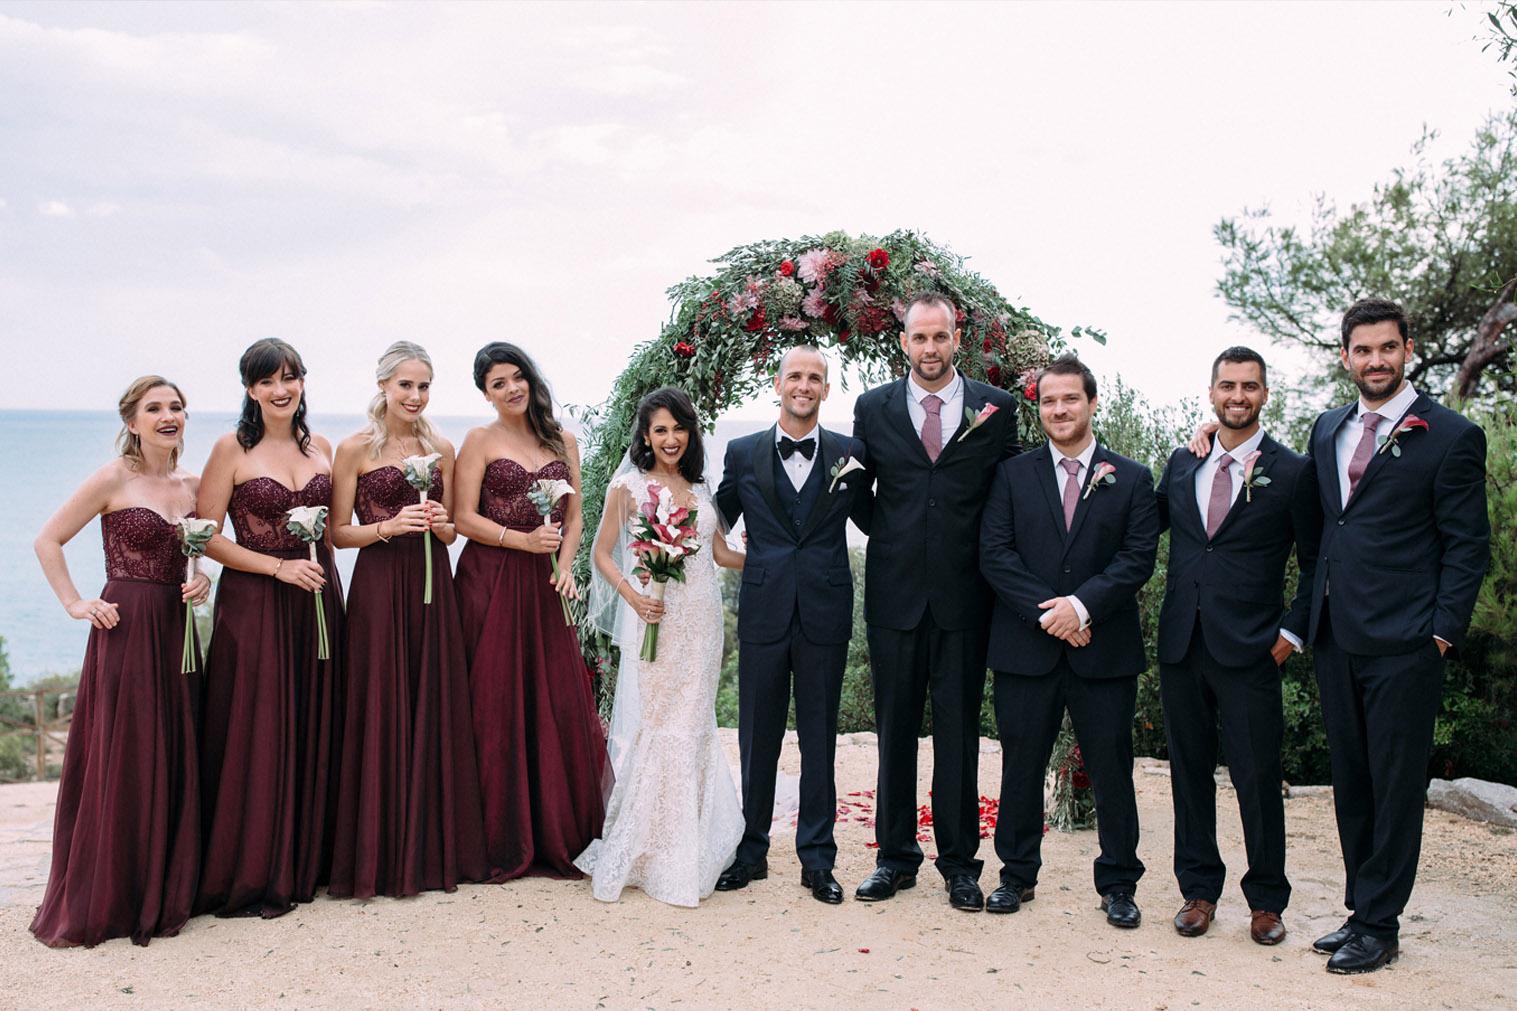 floral-arch-wedding-sitges